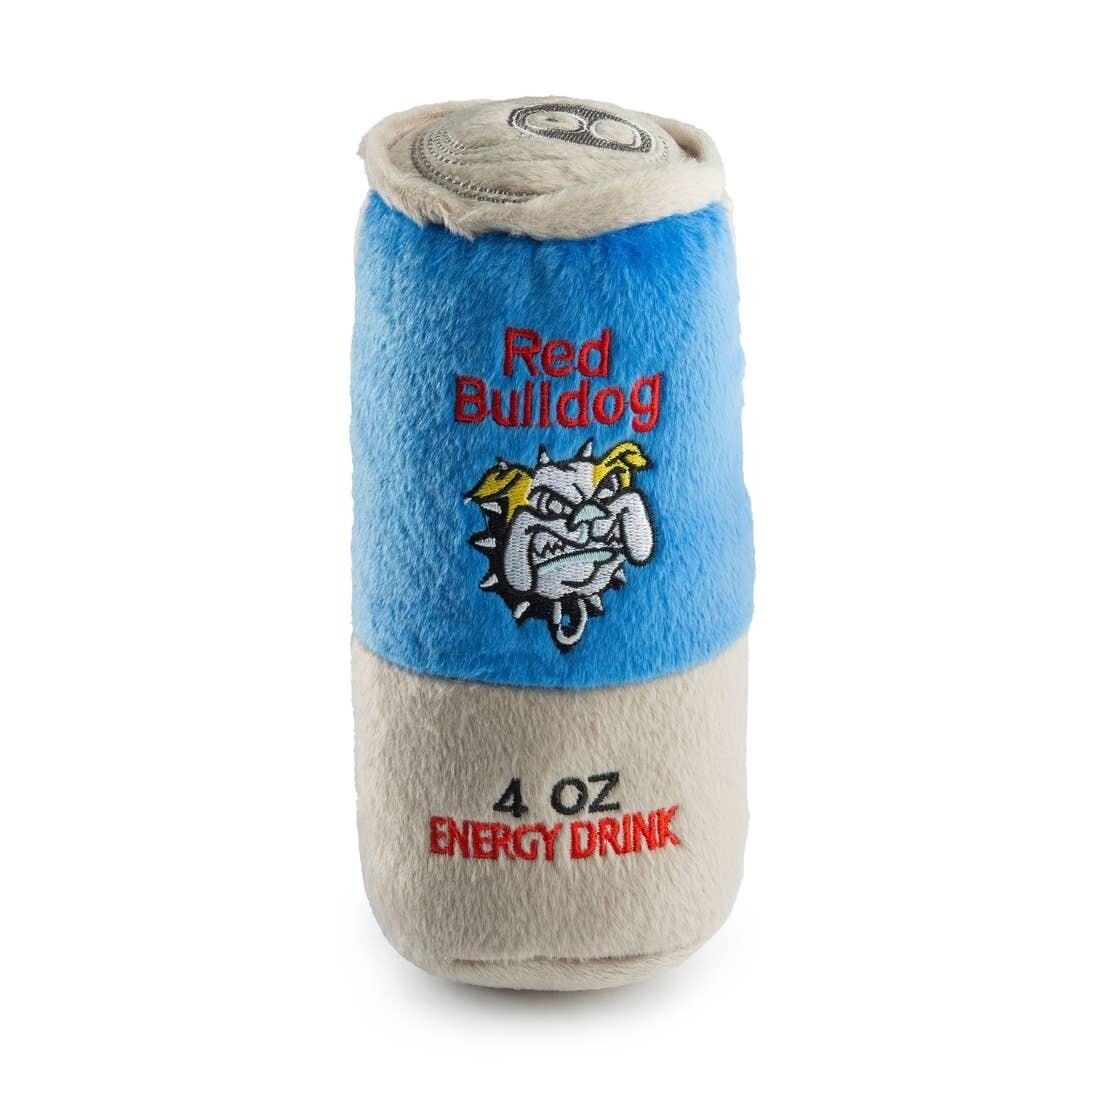 Red Bulldog Drink Toy